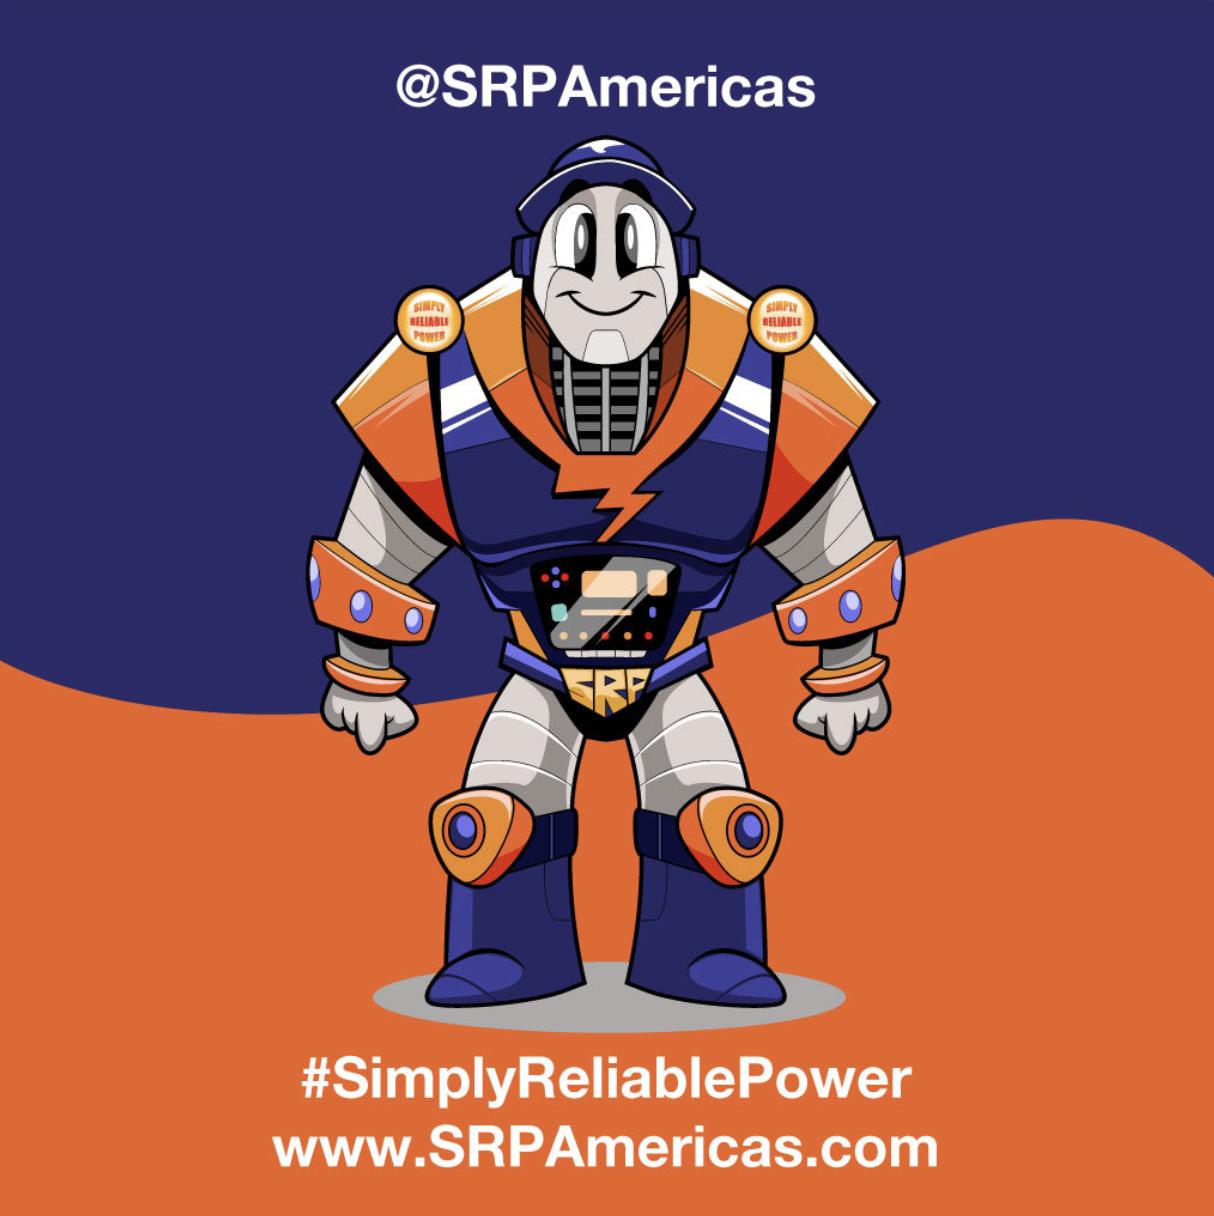 Simply Reliable Power Inc - 10151 Business Drive, Miramar, Florida 33025Tel +1 954 433-2212 / Fax +1 954 433-4431info@srpamericas.com